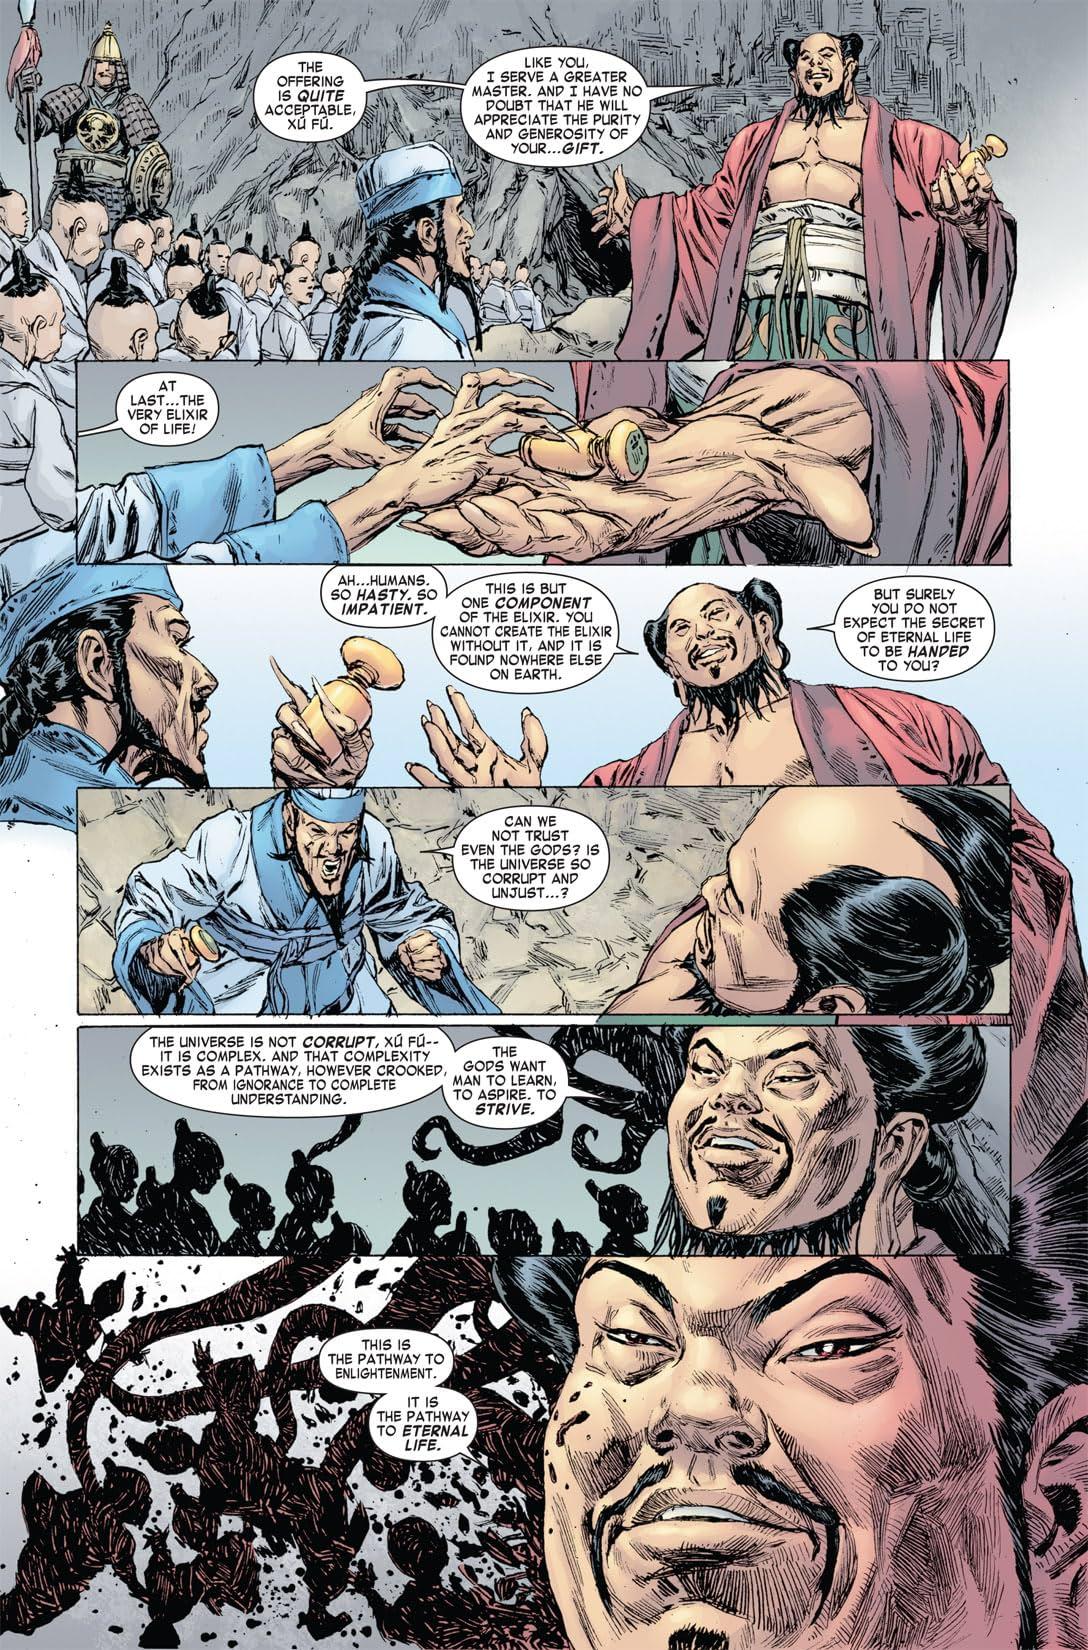 Captain America: Hail Hydra #3 (of 5)